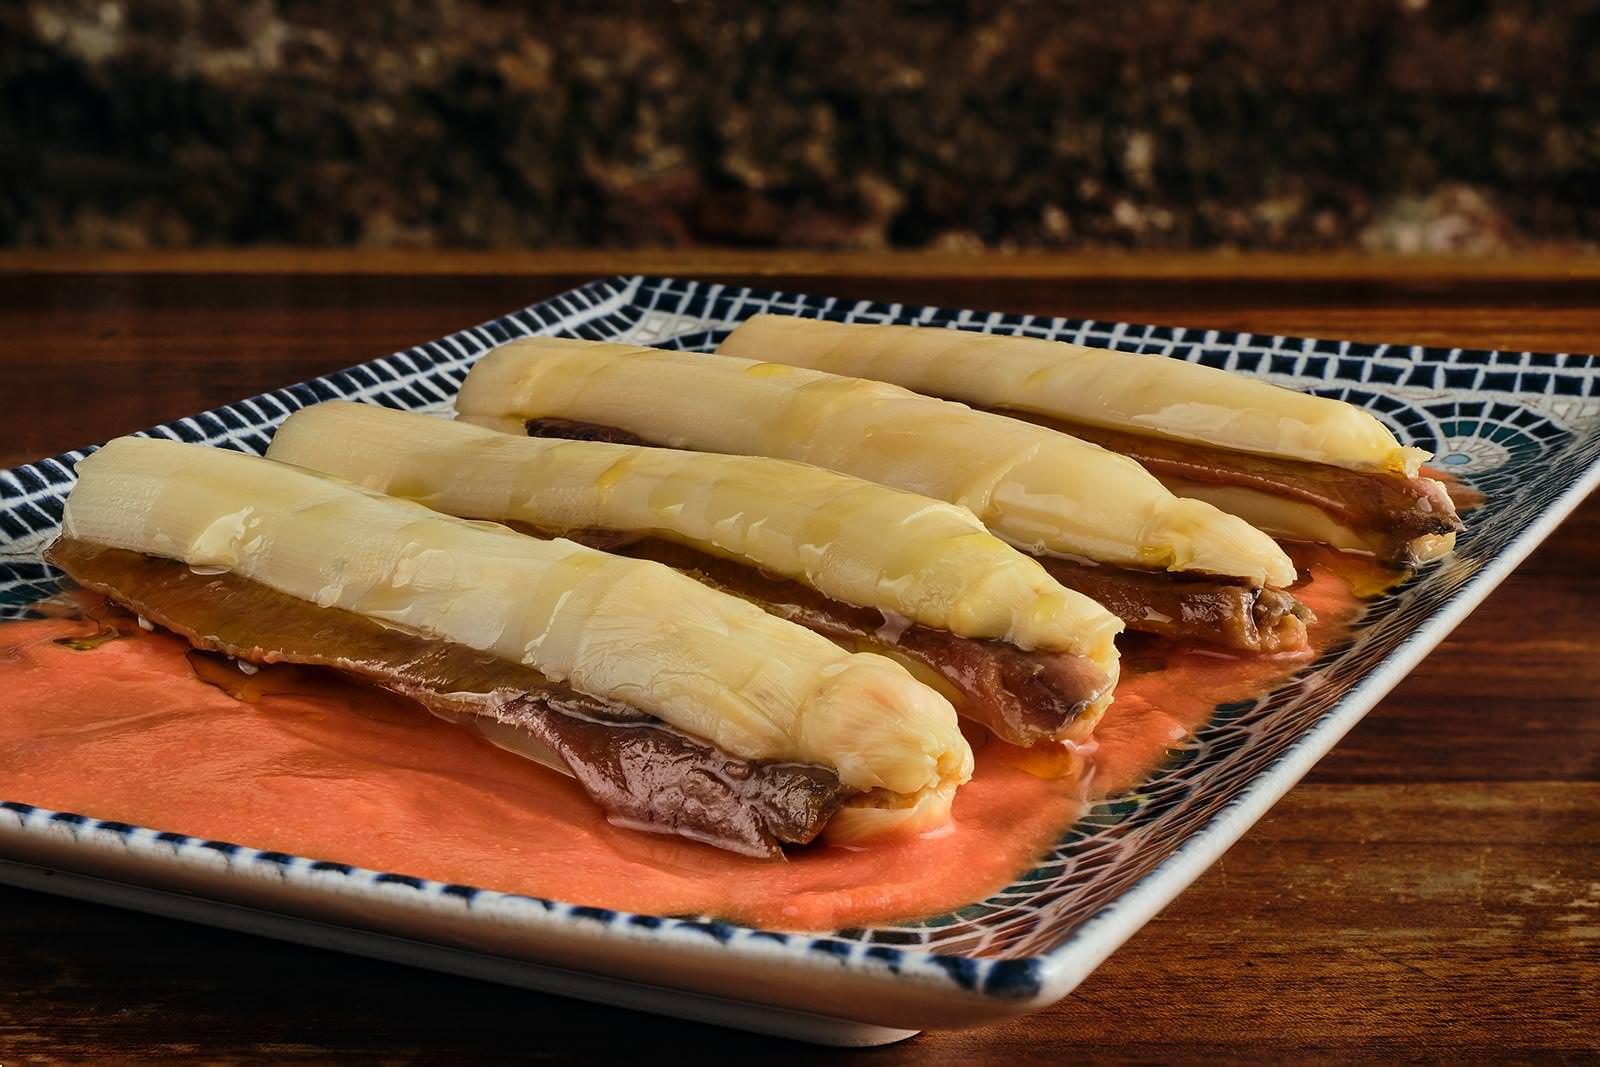 fotografia_plato_restaurante_granada_01 Fotografía Culinaria Granada - La Tabernilla del Darro Gastronómica